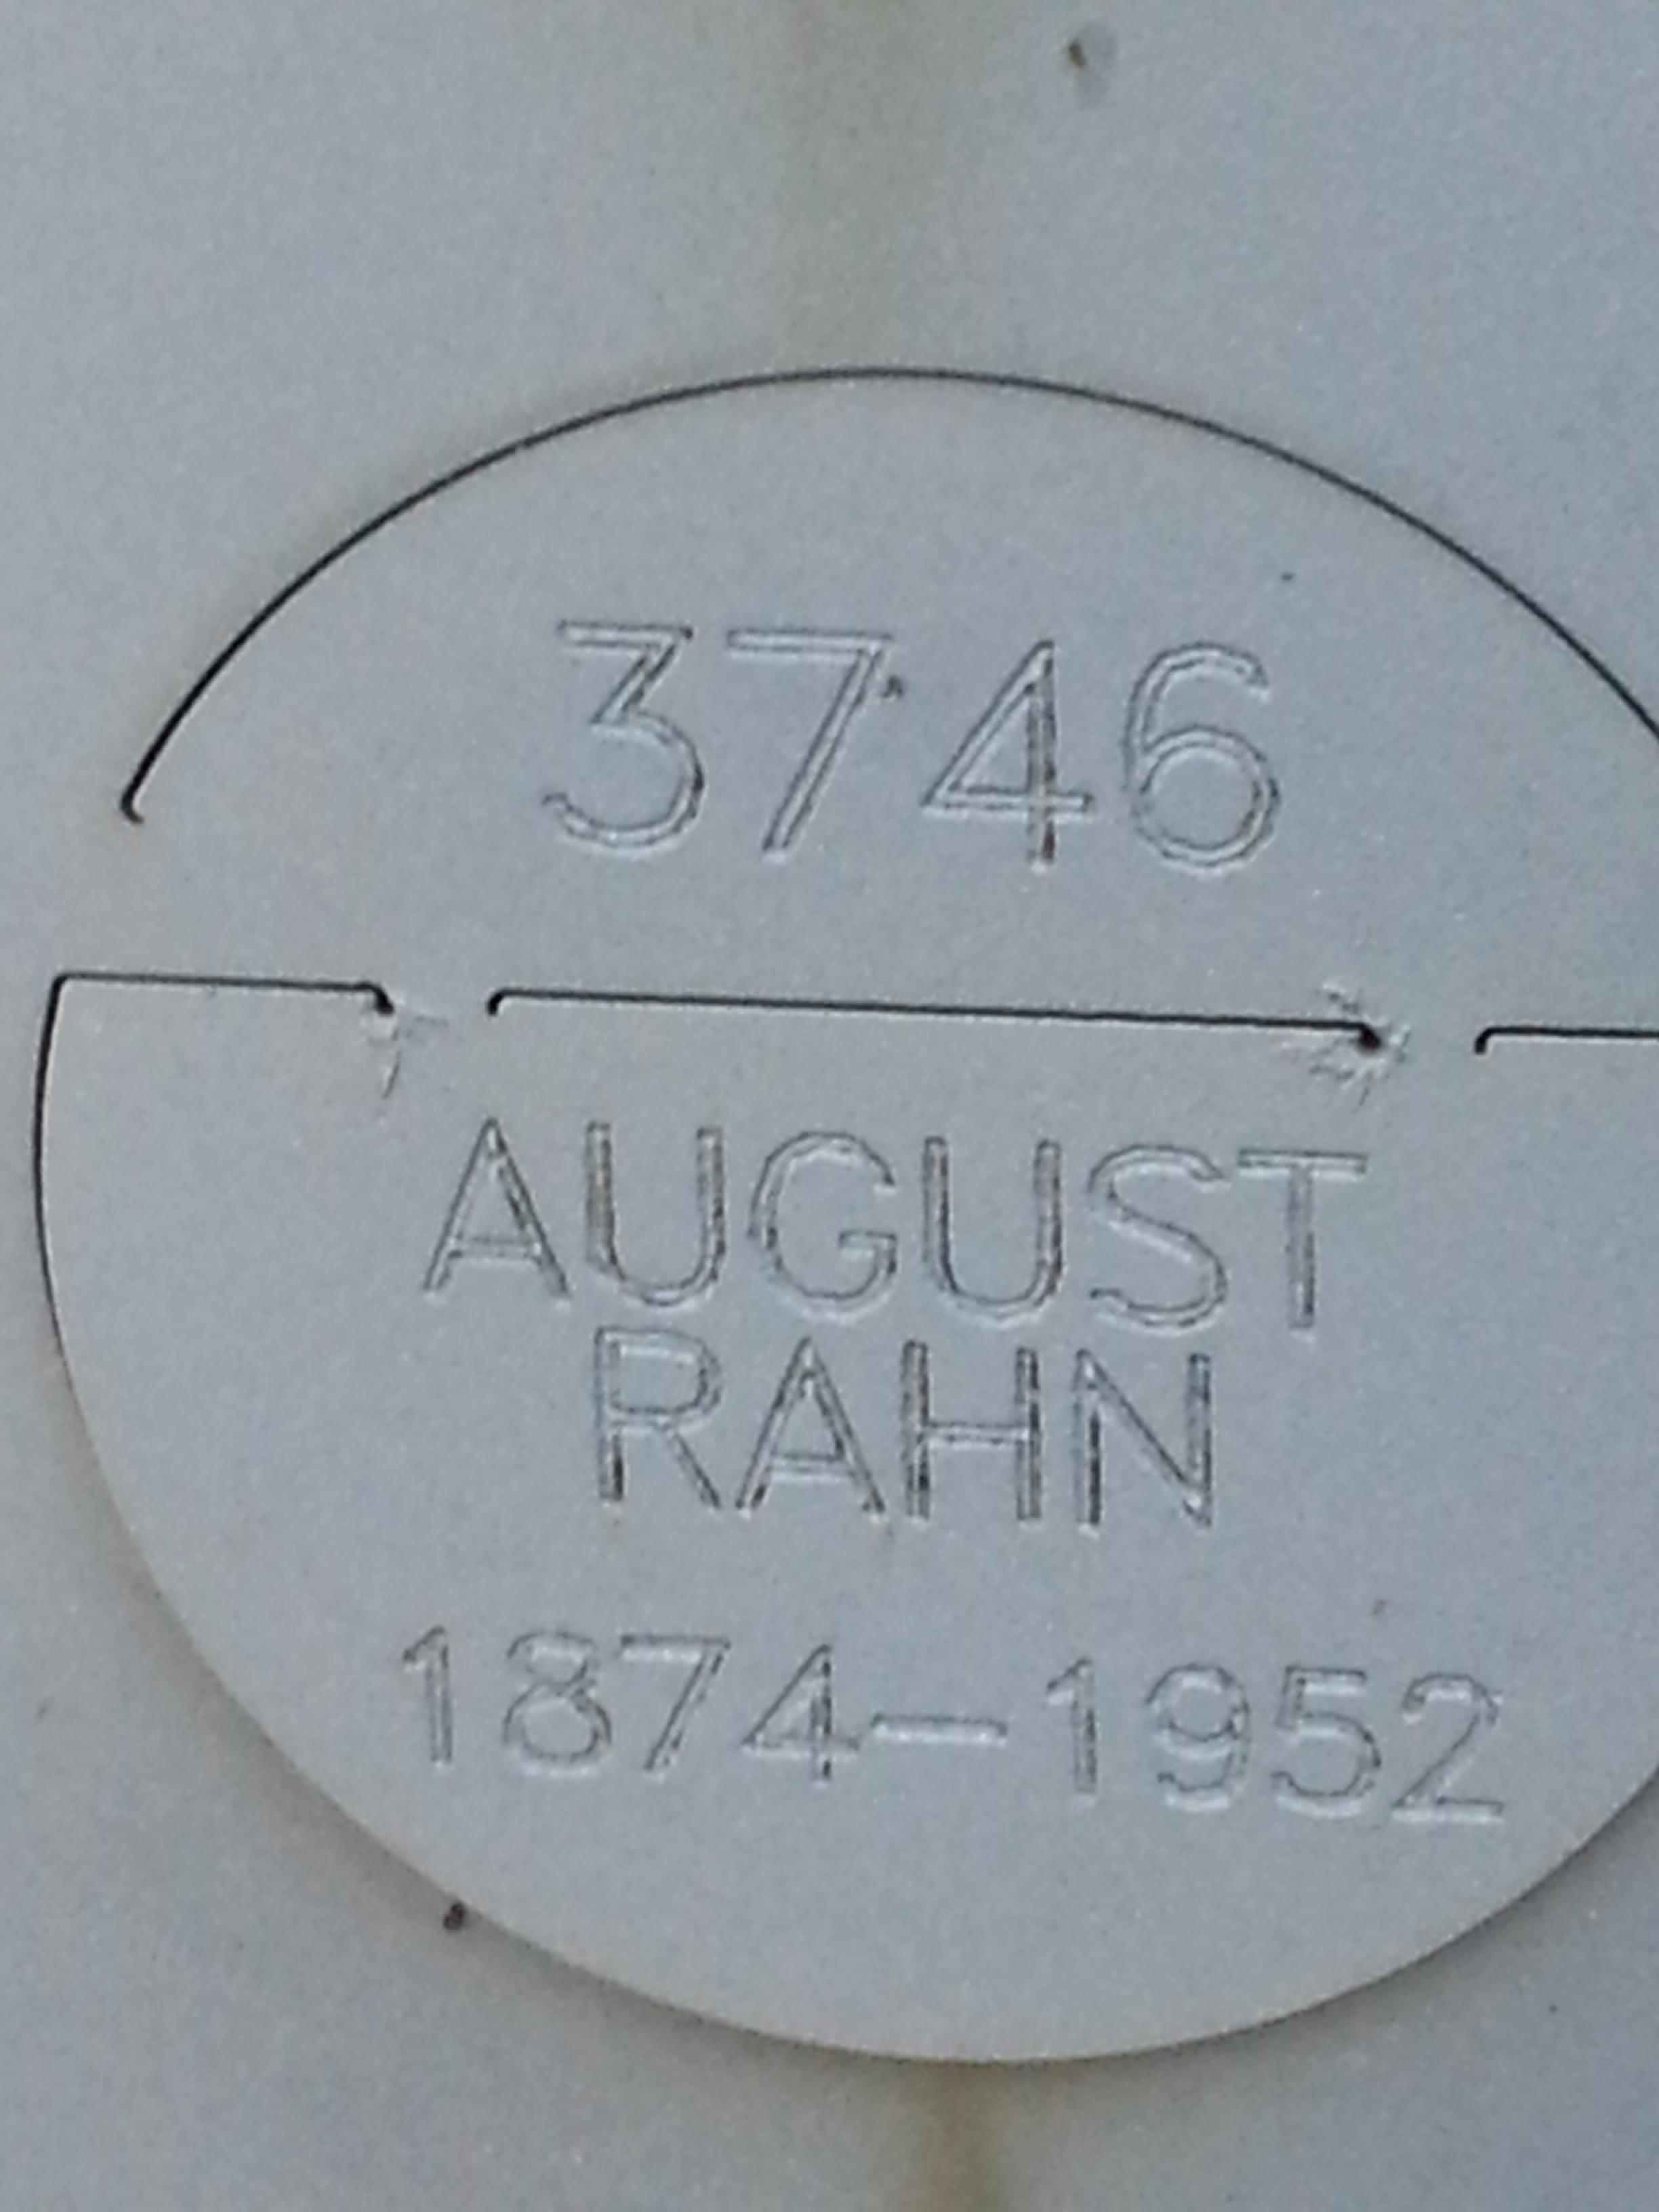 August C. Rahn